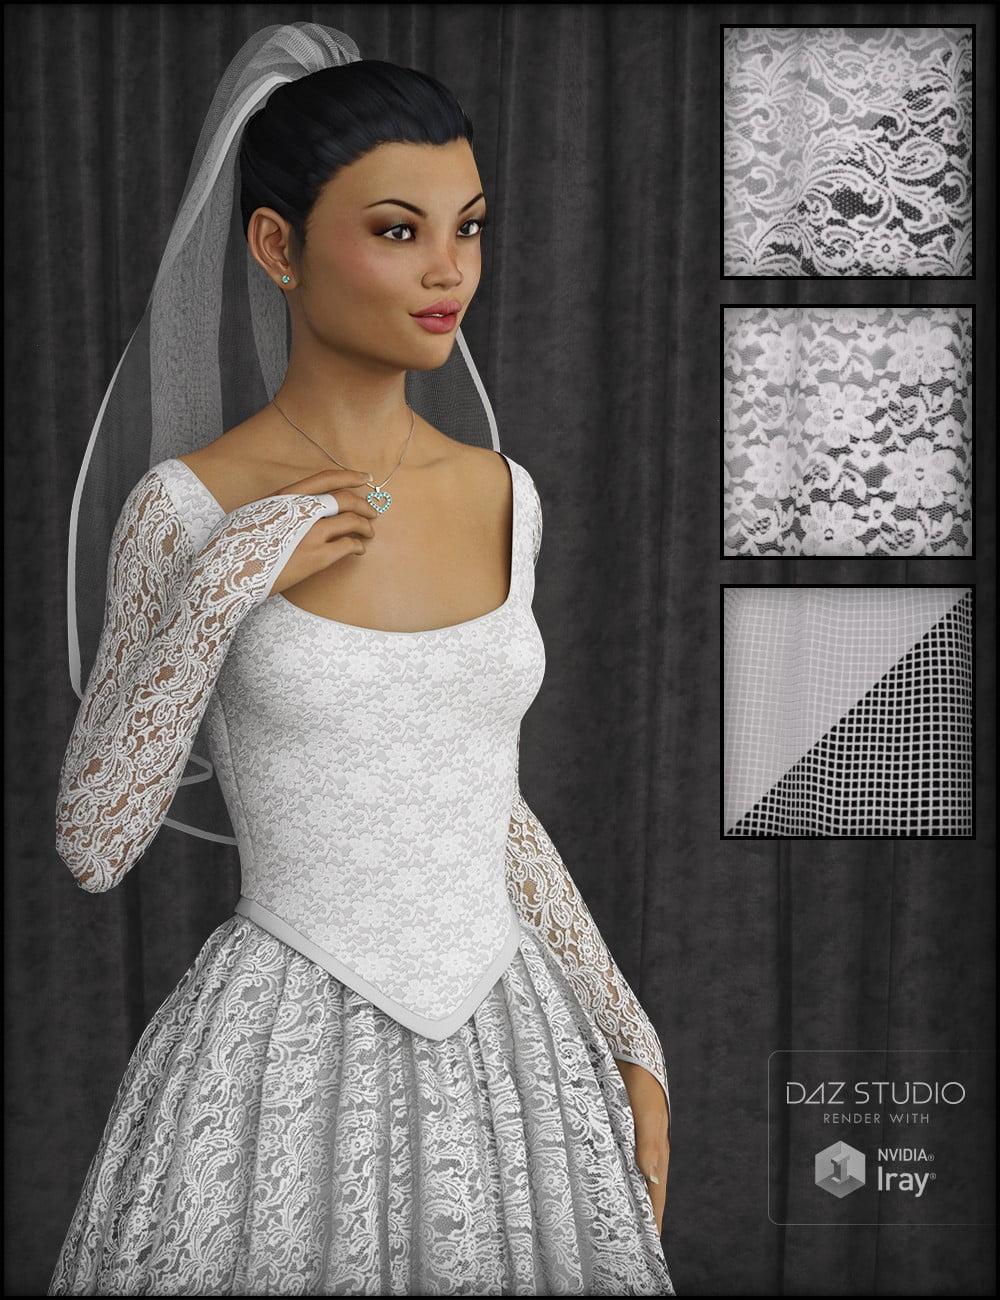 06-fabric-basics-lace-for-iray-daz3d